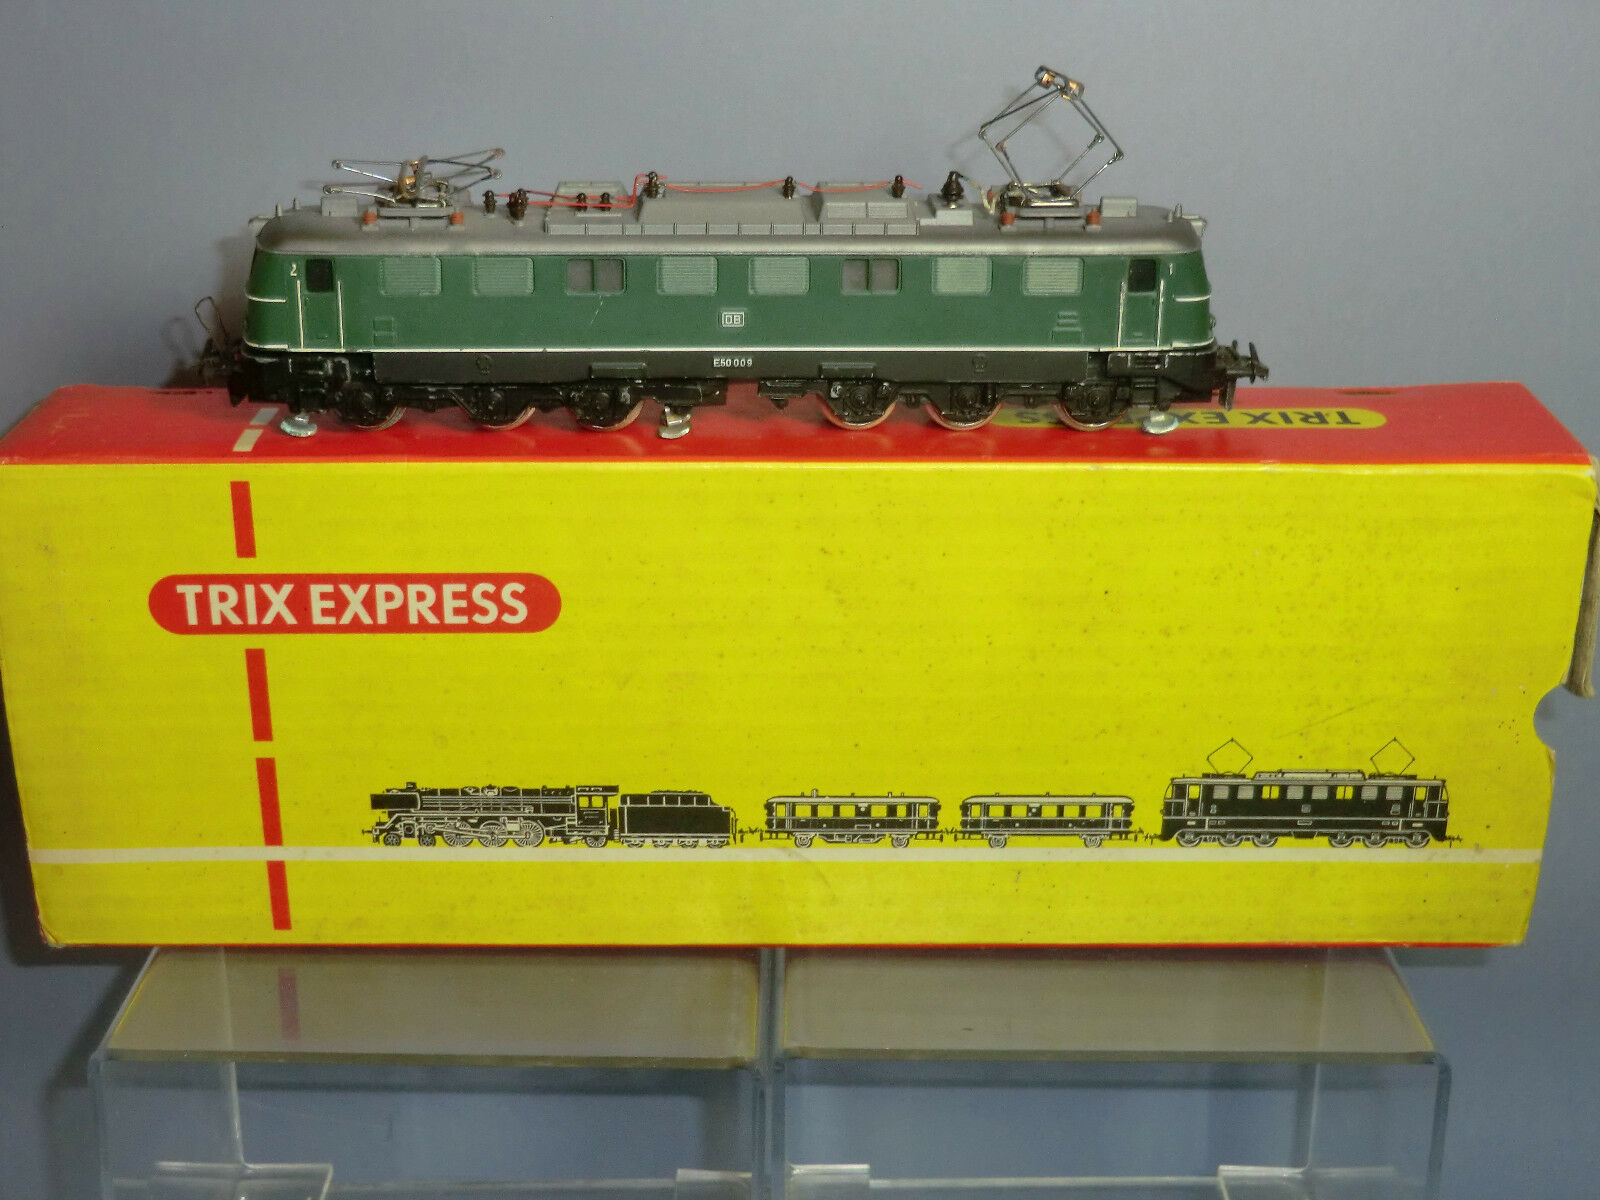 Modelo Trix Xpress.- Sí.DB clase e50 Co. Número Número Número e59 009 Locomotora eléctrica Vn MIB. b8d